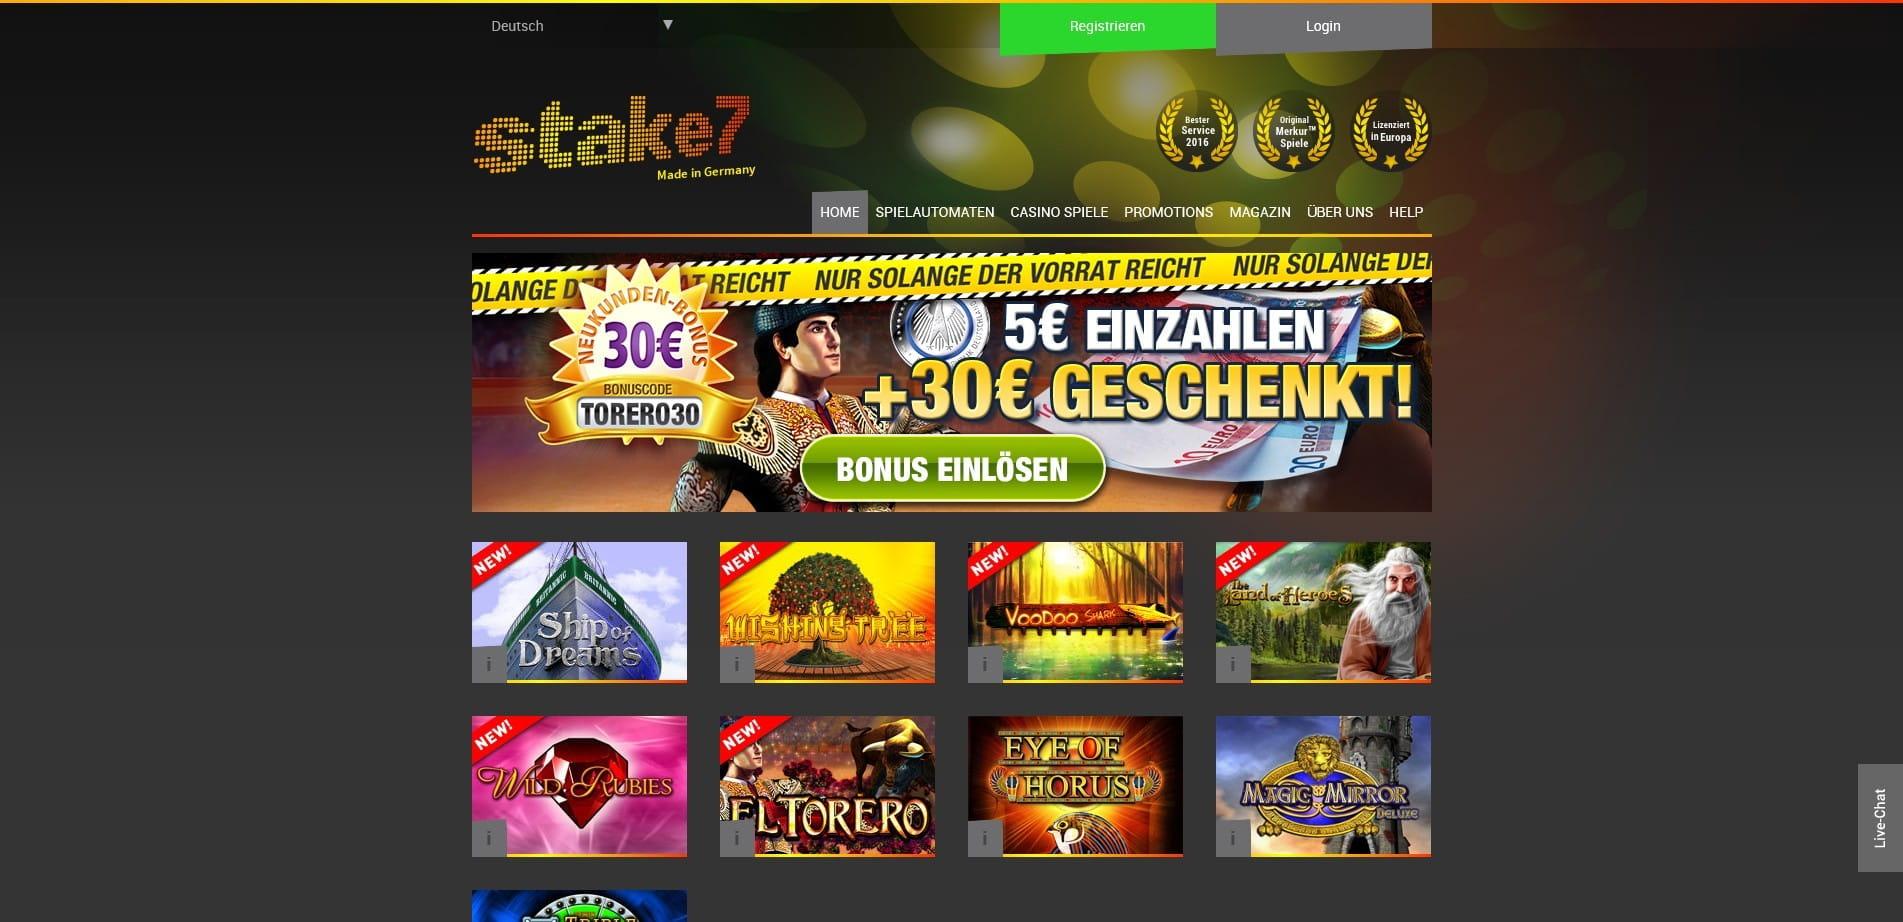 5 Euro Einzahlen Casino